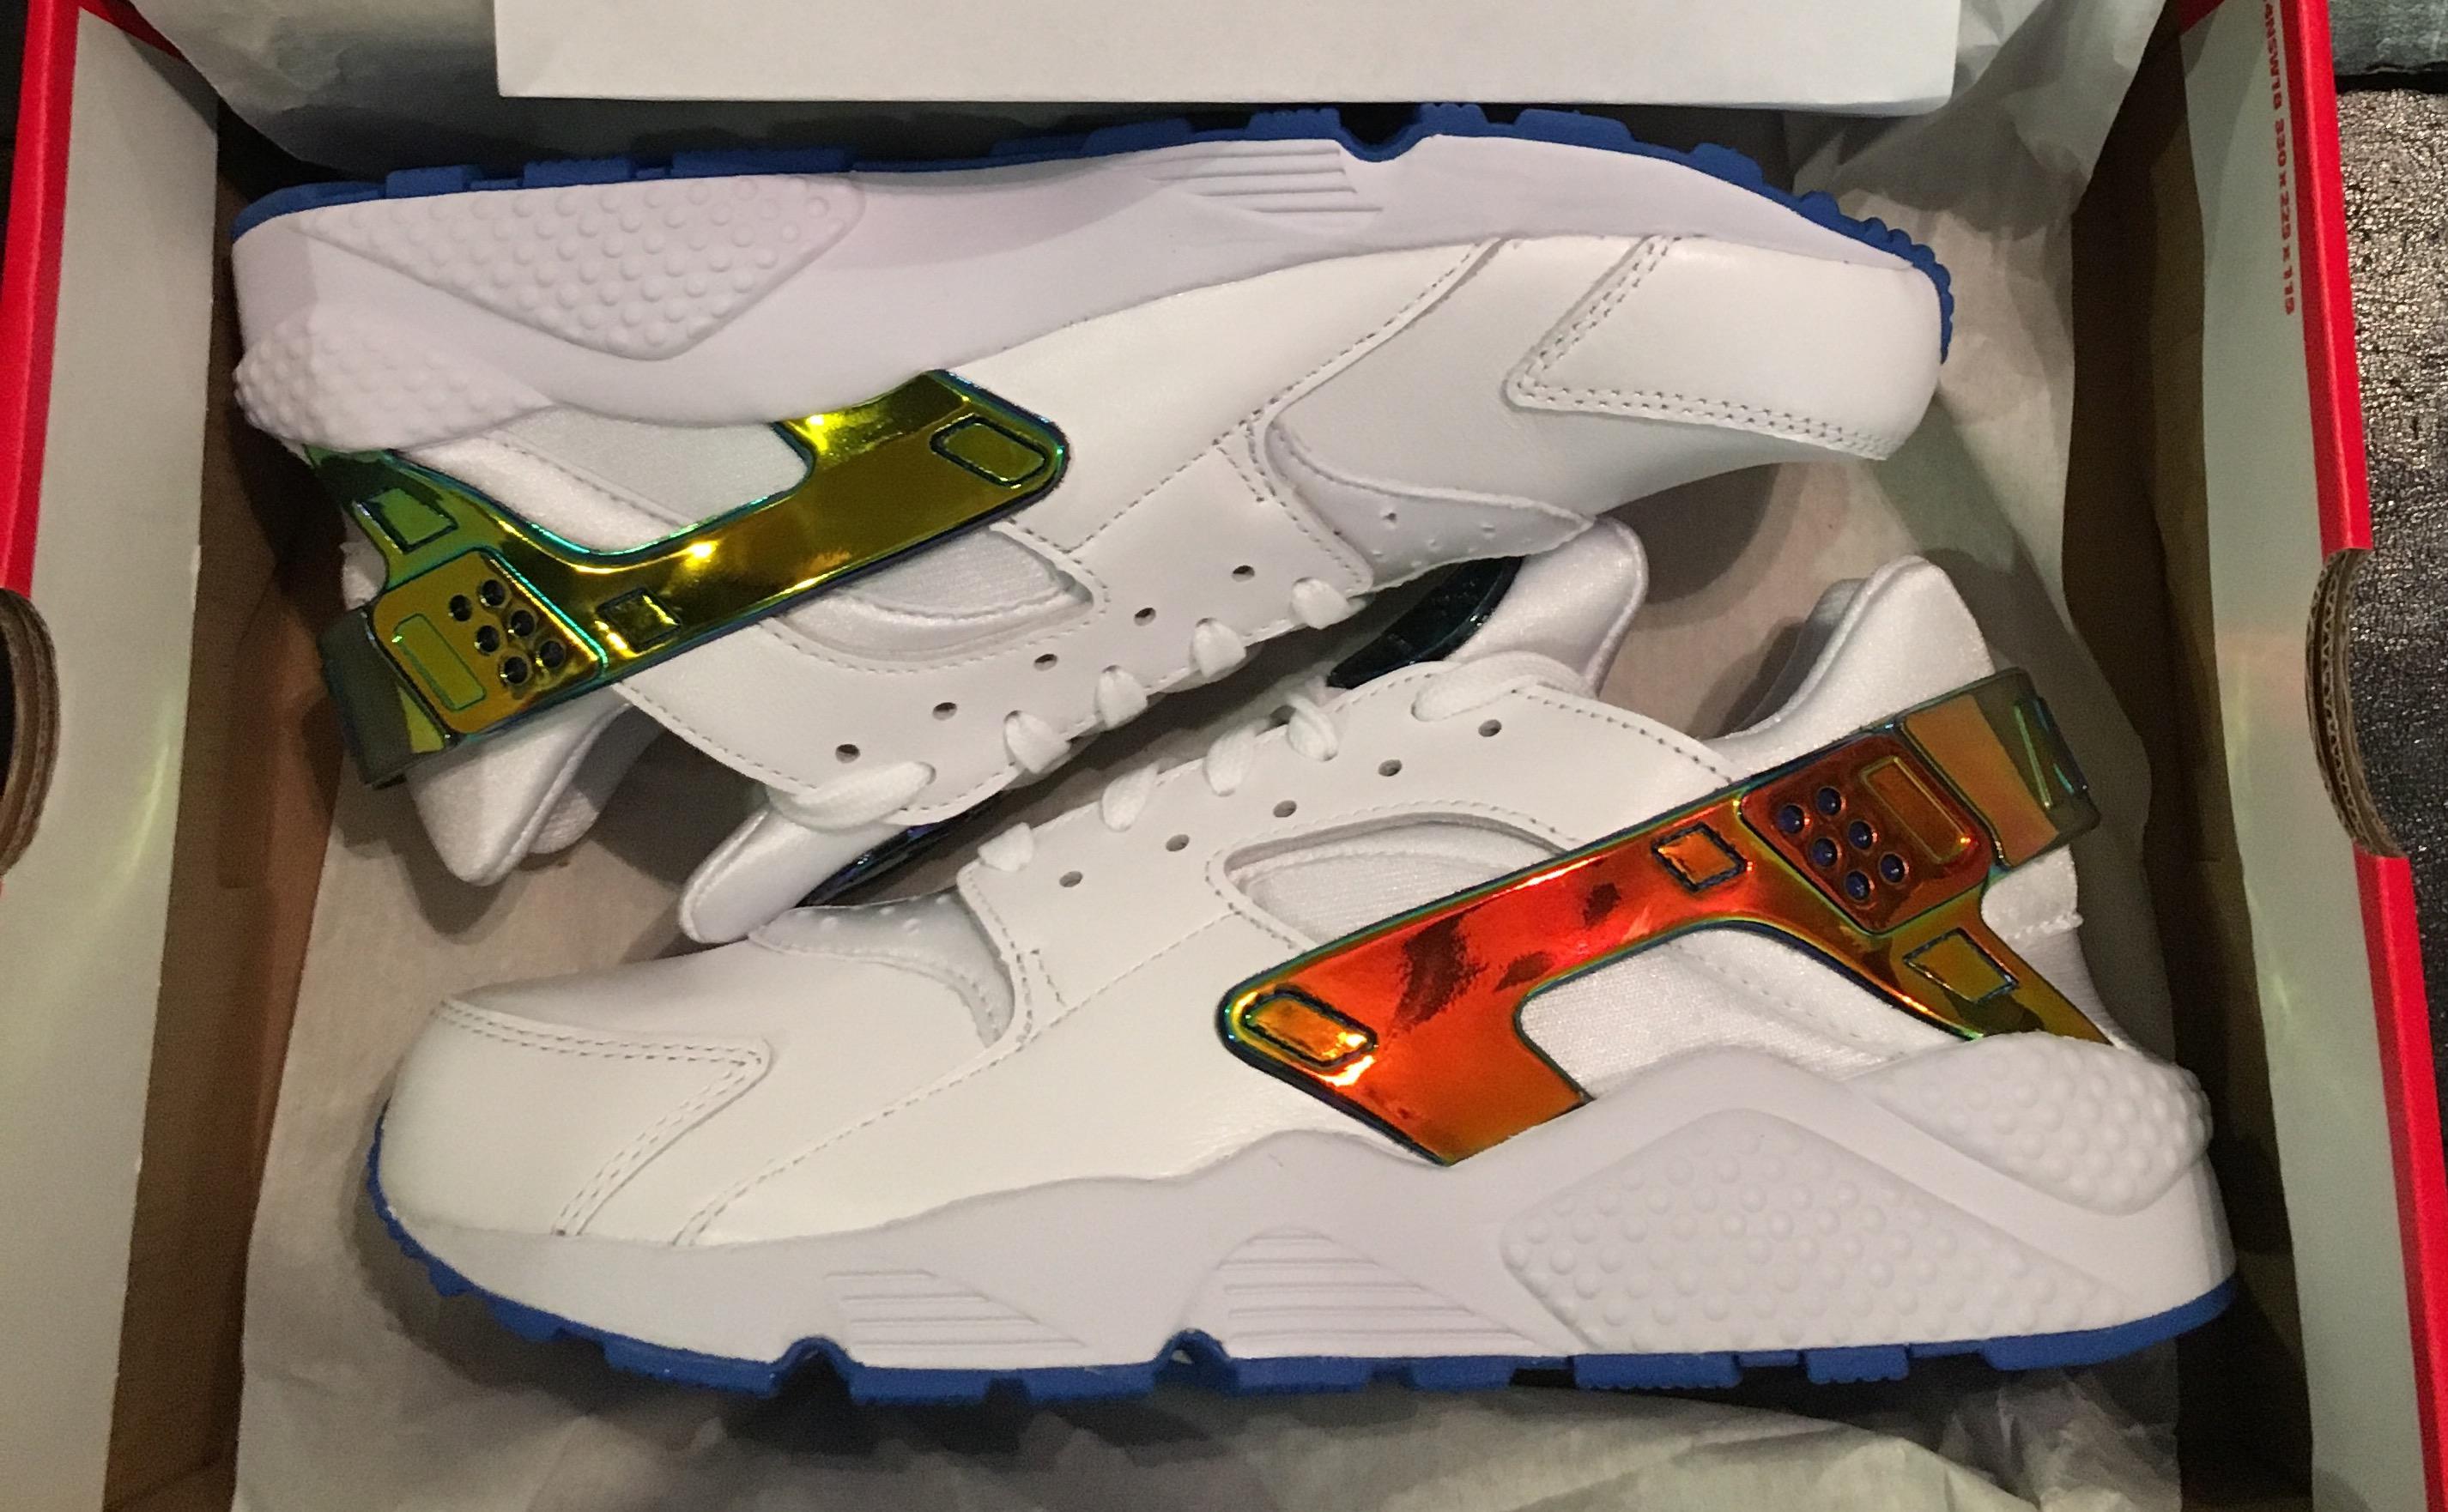 4a7d87147ea9 Nike Nike Air x Nice Kicks Huarache Lowrider Size 9 - Low-Top ...